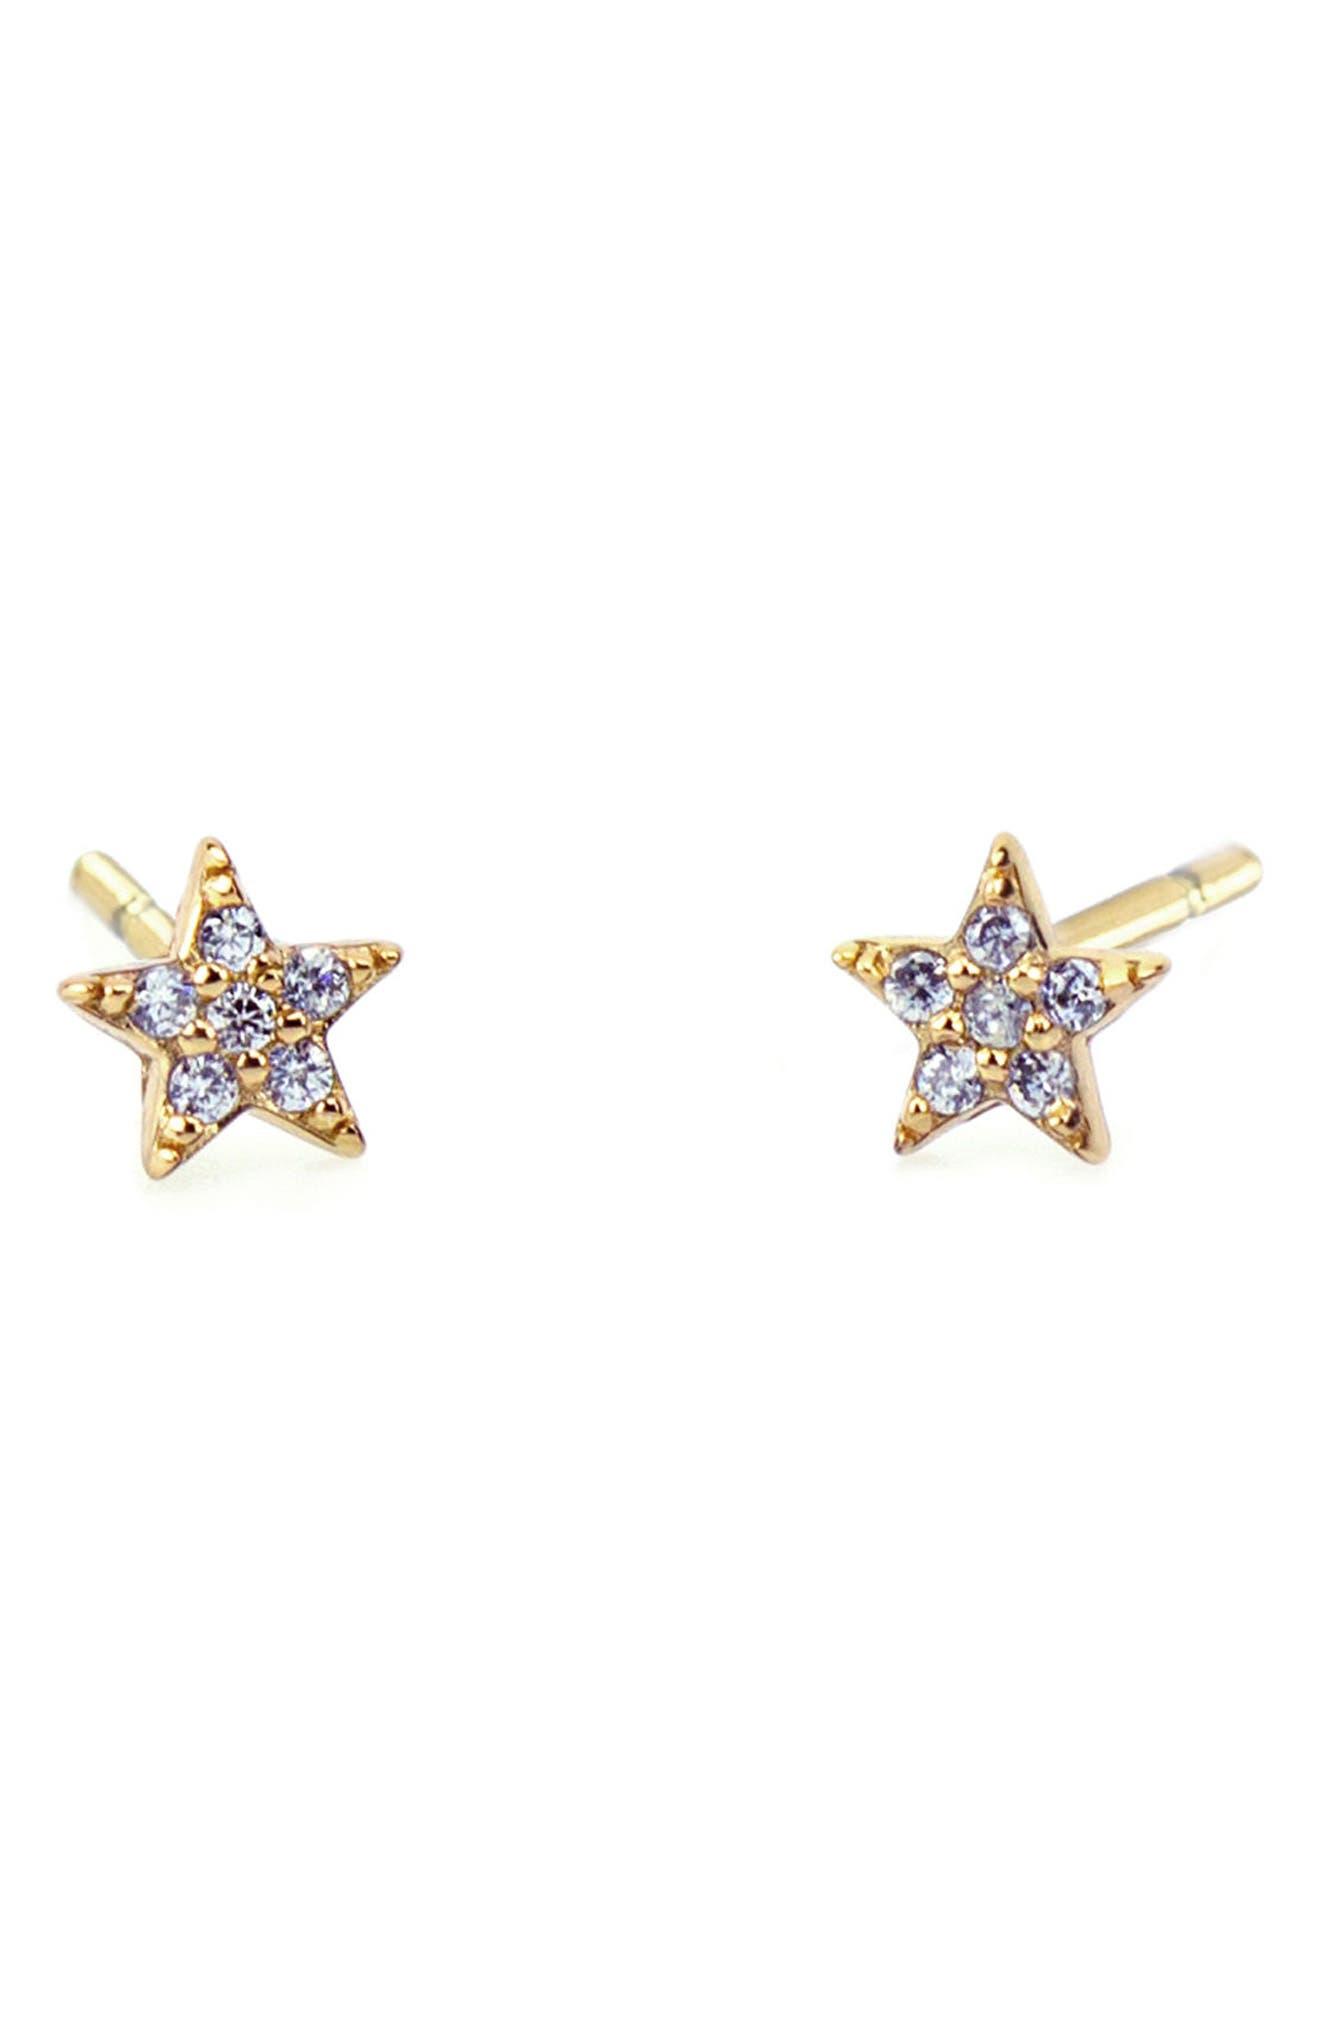 Main Image - Kris Nations Pavé Star Stud Earrings